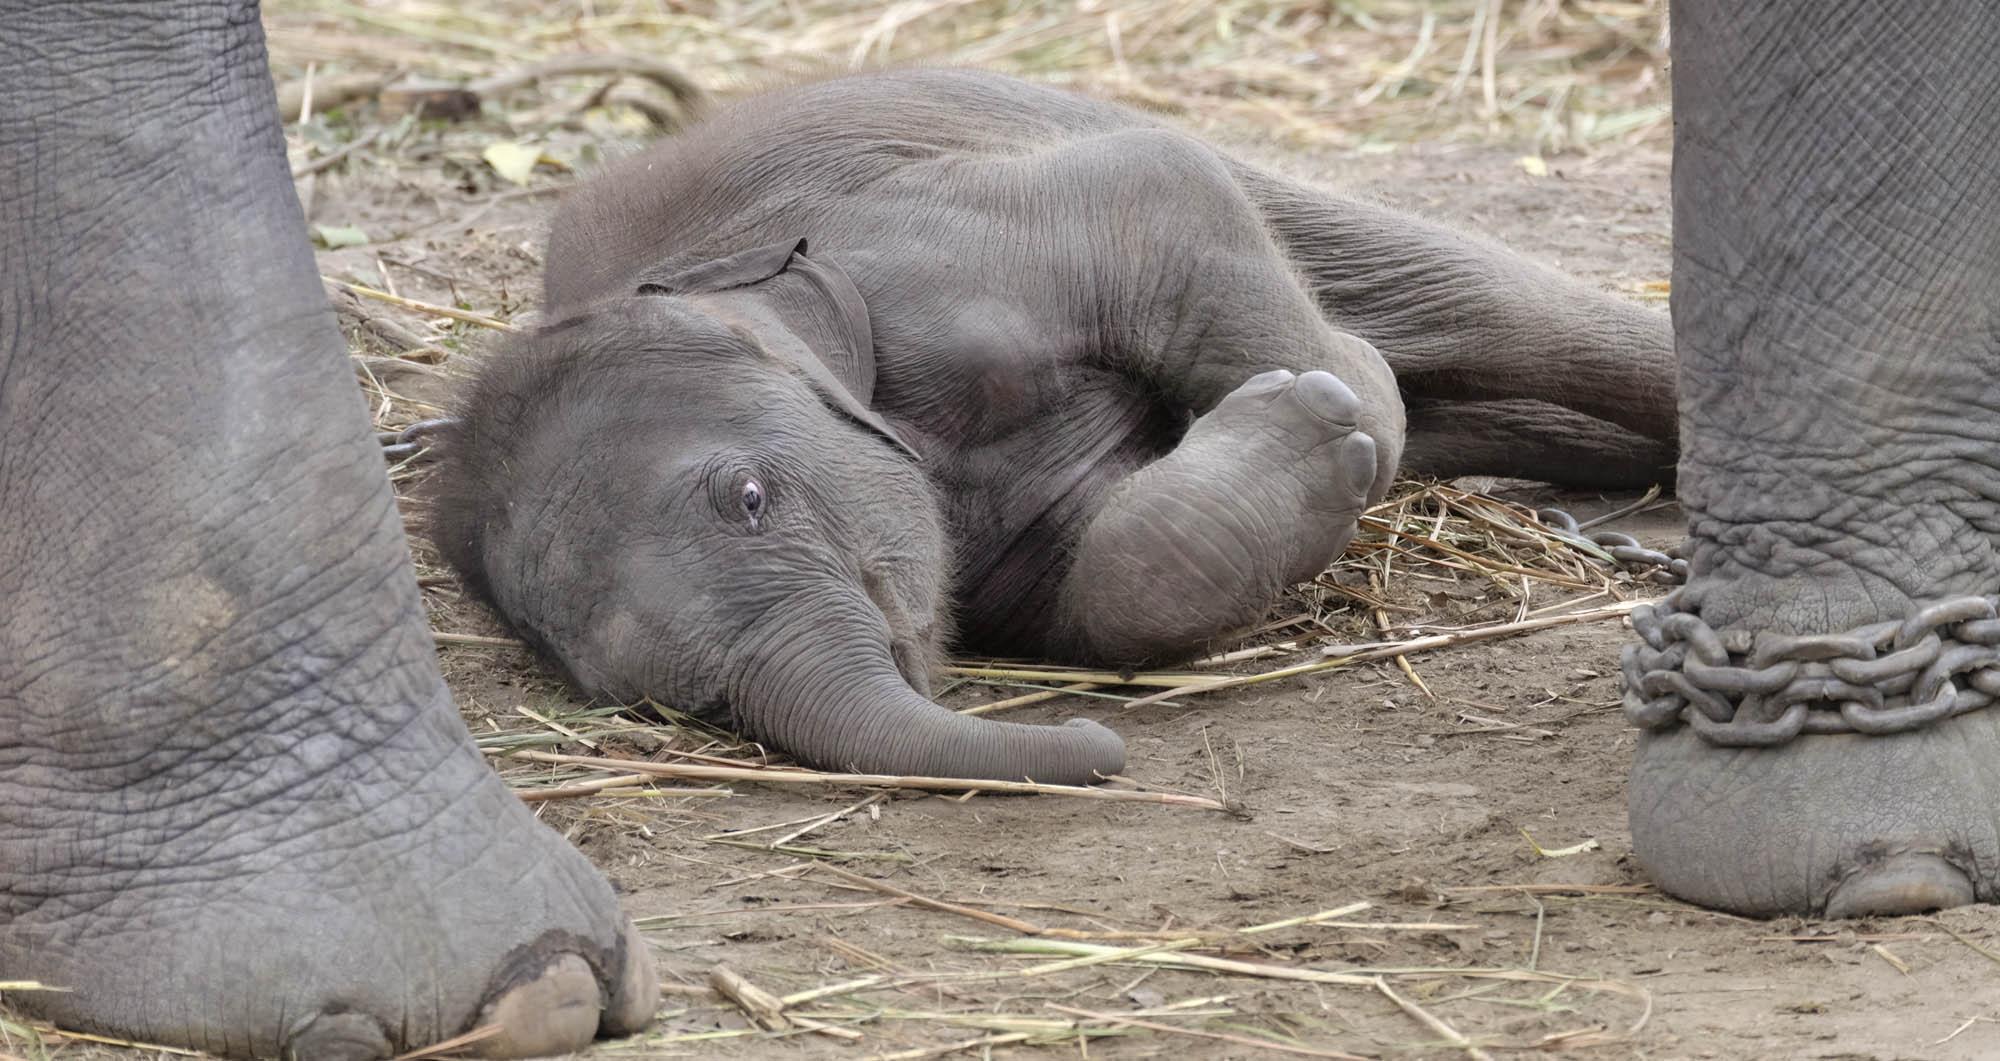 reise-ansichten Elefanten Kind Kaziranga